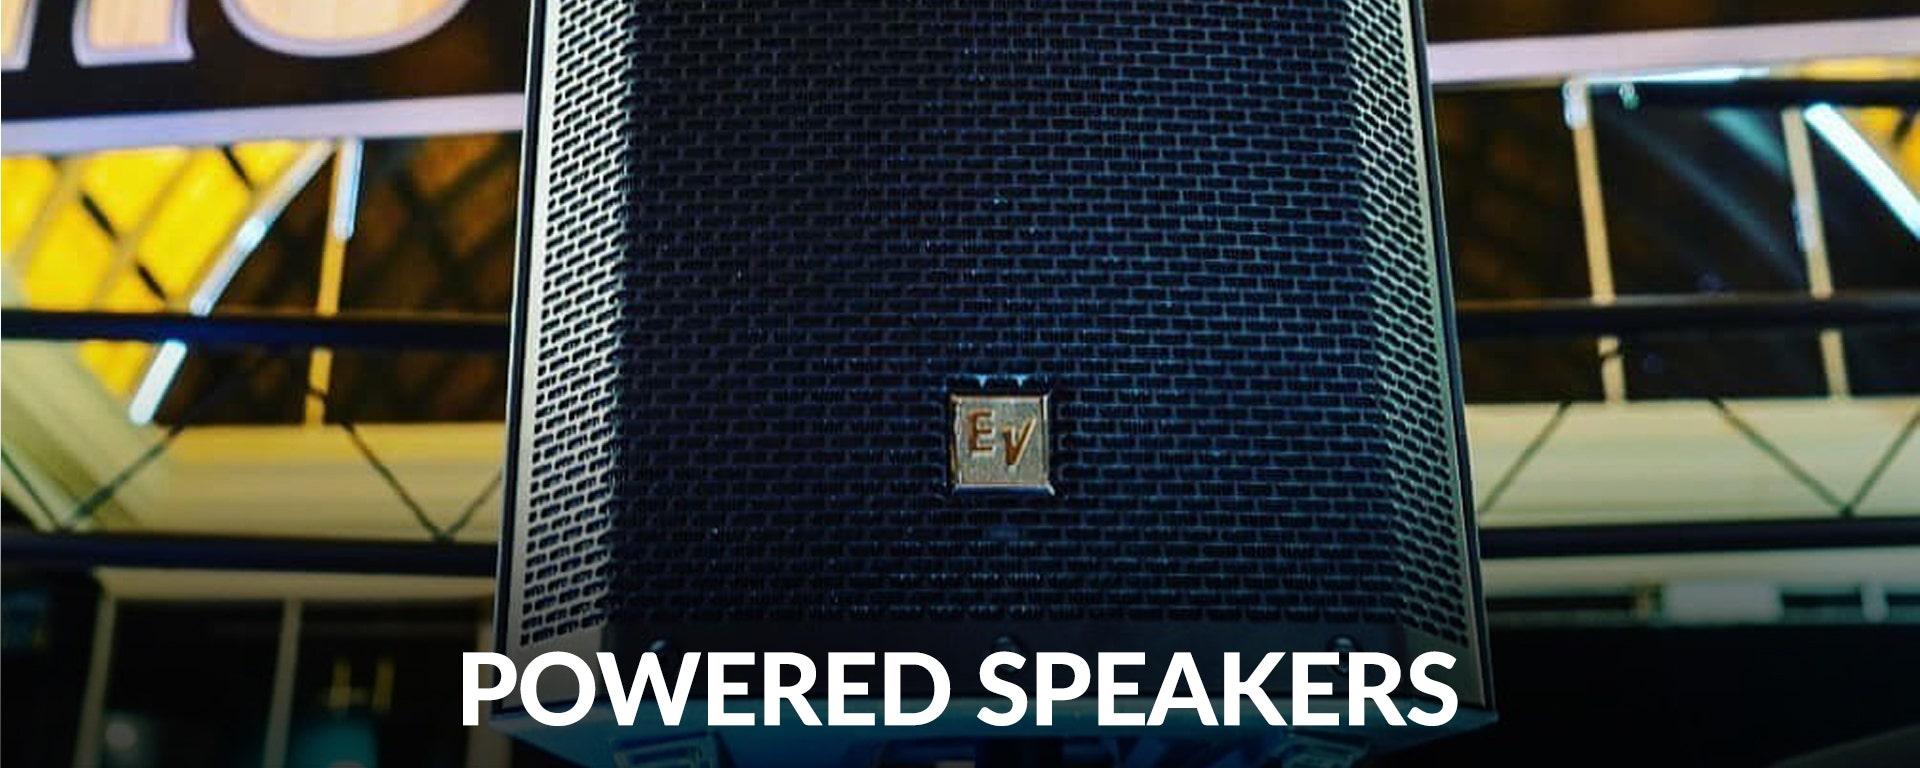 Powered Speakers at SamAsh.com